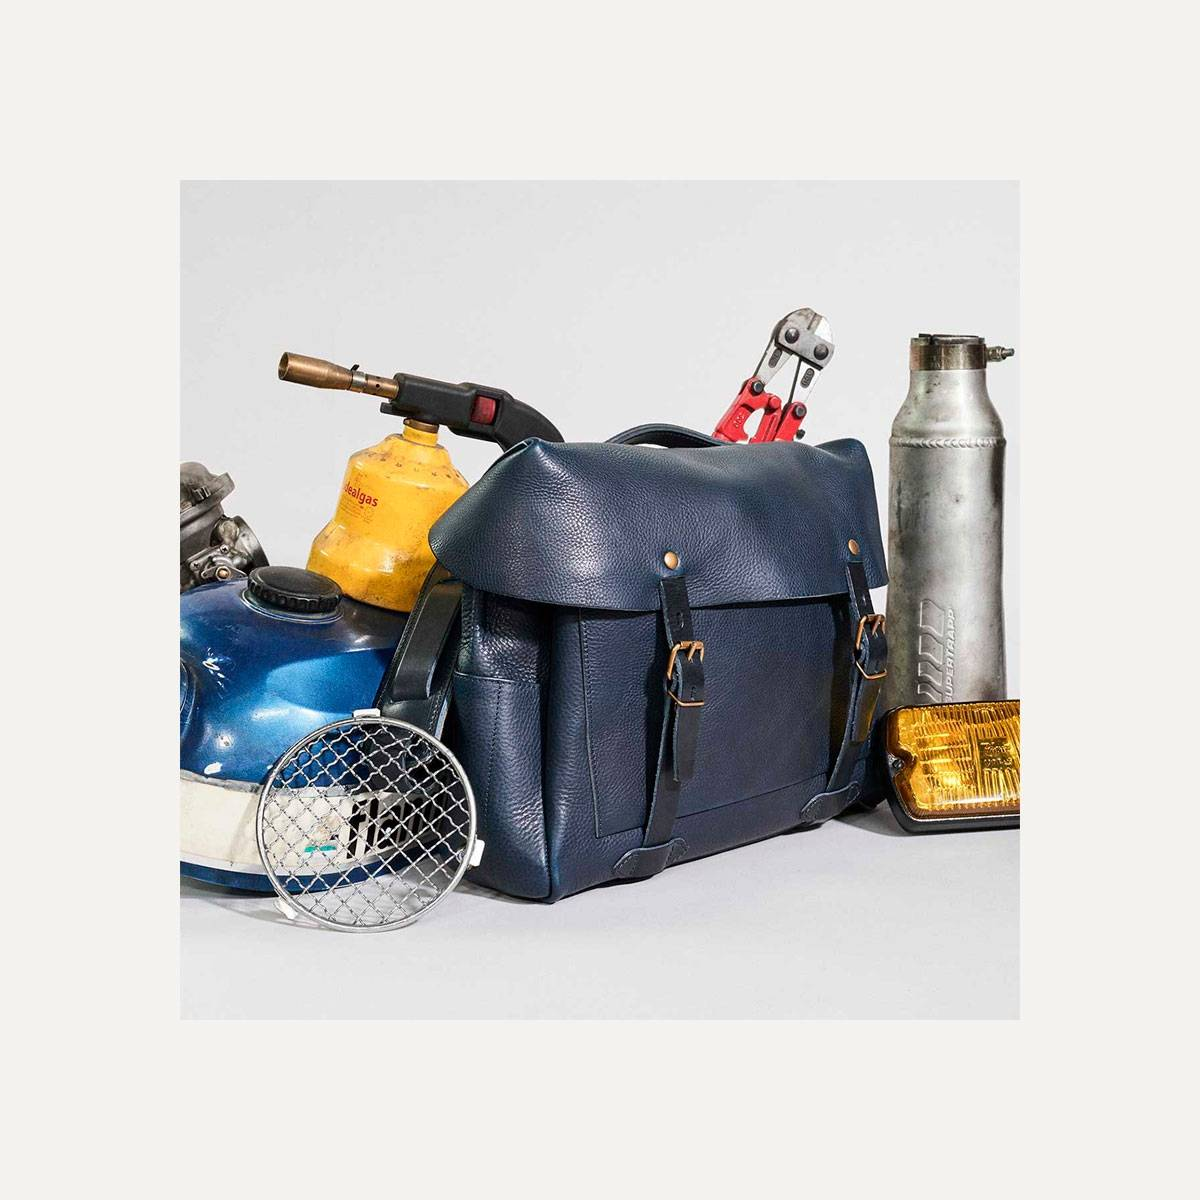 Bleu de Chauffe x Blitz Eclair bag - Navy (image n°9)